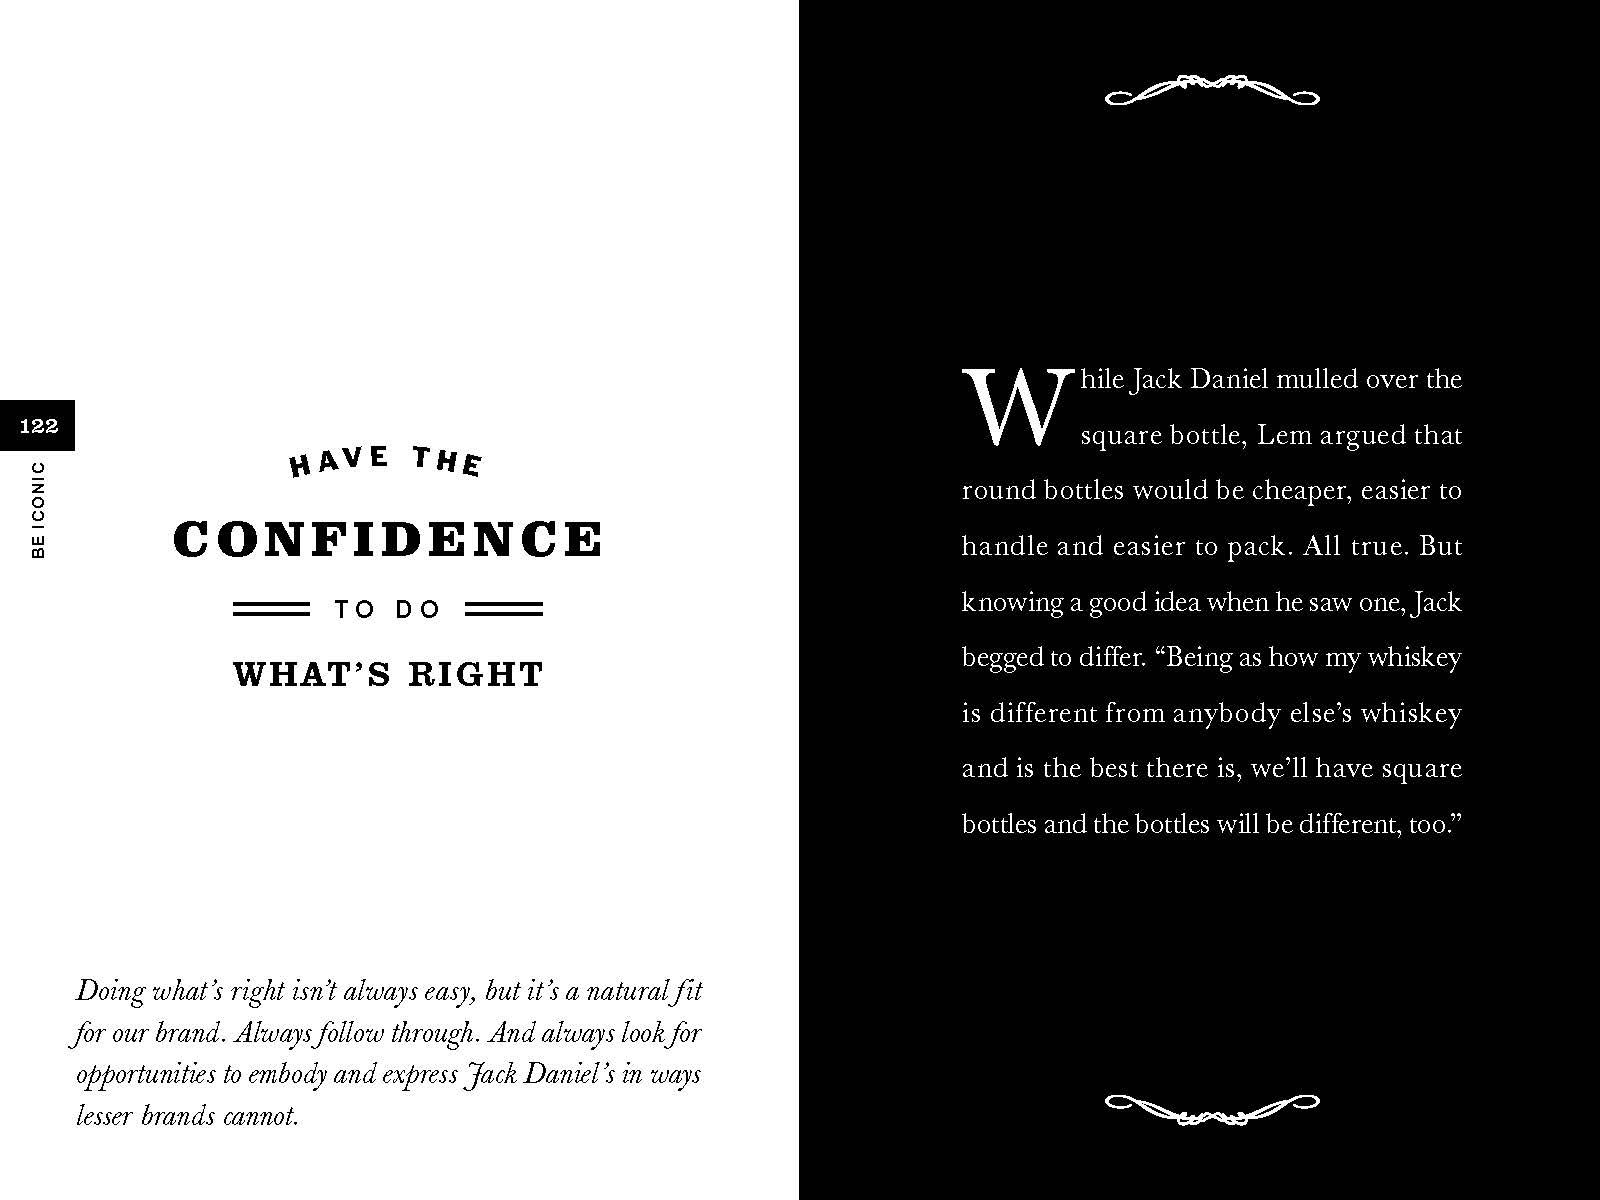 Jack Daniel's Guiding Principles 2012_Page_65.jpg